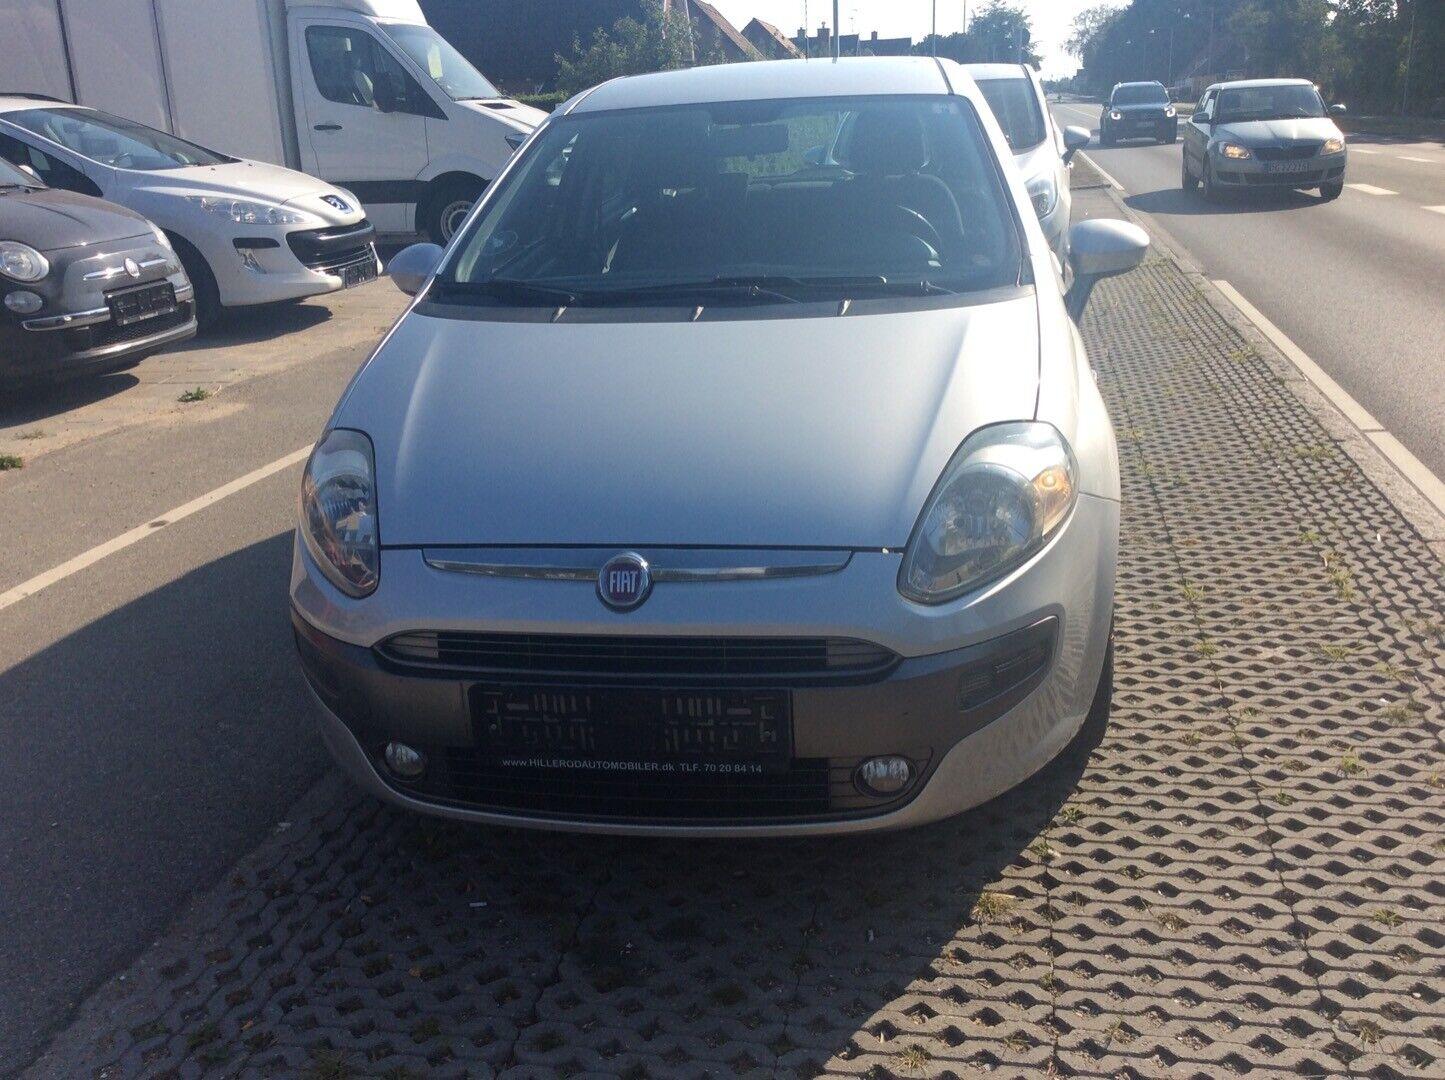 Fiat Punto Evo 1,3 MJT 75 Dynamic 5d